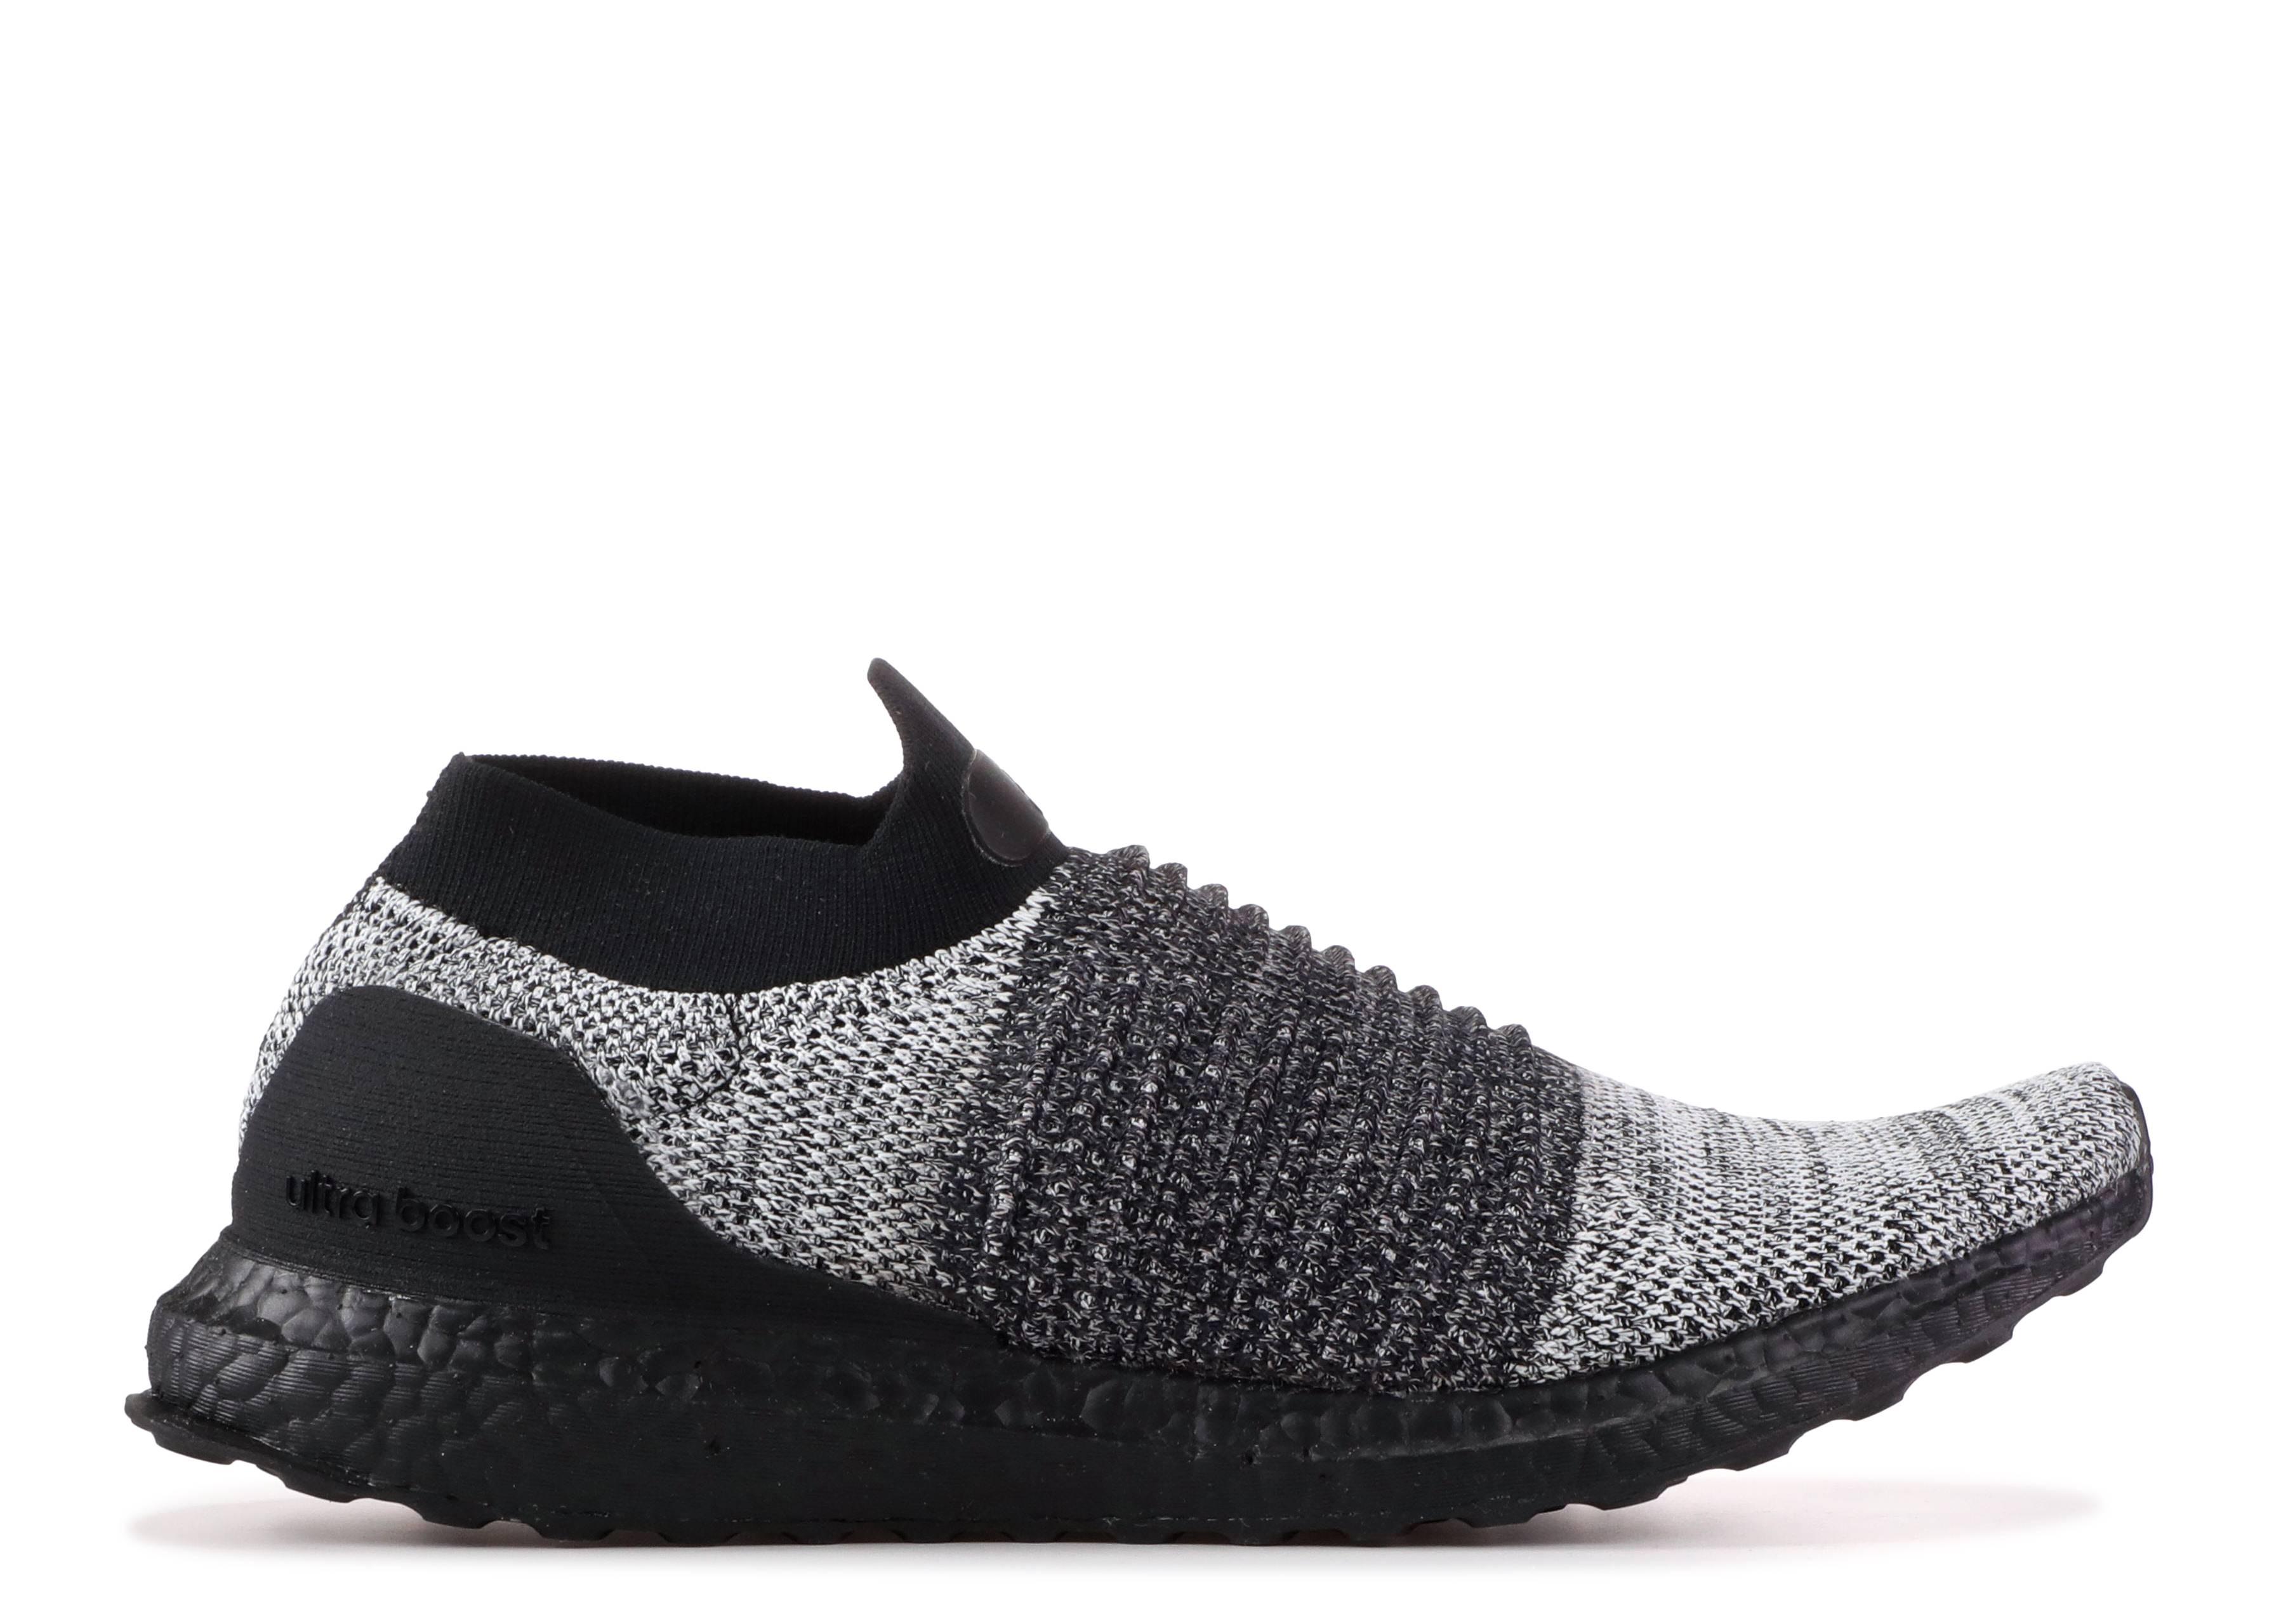 best sneakers e4190 8c0c5 UltraBOOST Laceless - Adidas - BB6173 - black/black | Flight ...